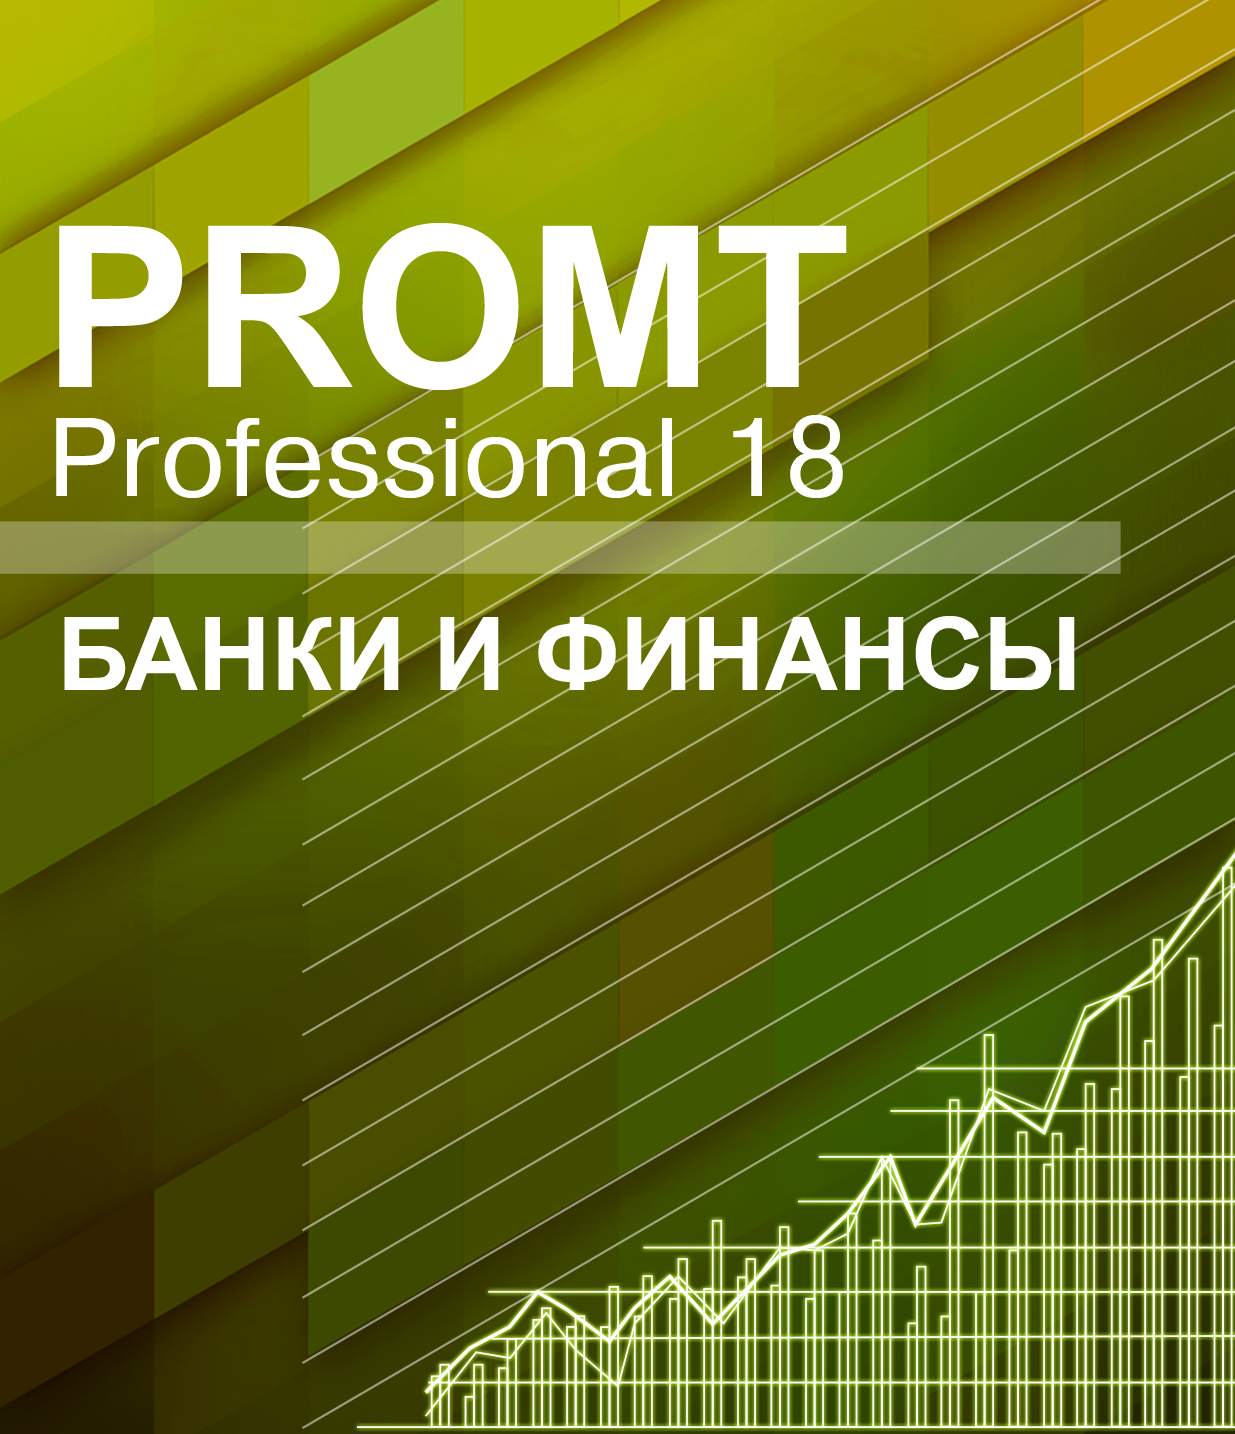 PROMT Professional 18 Банки и финансы